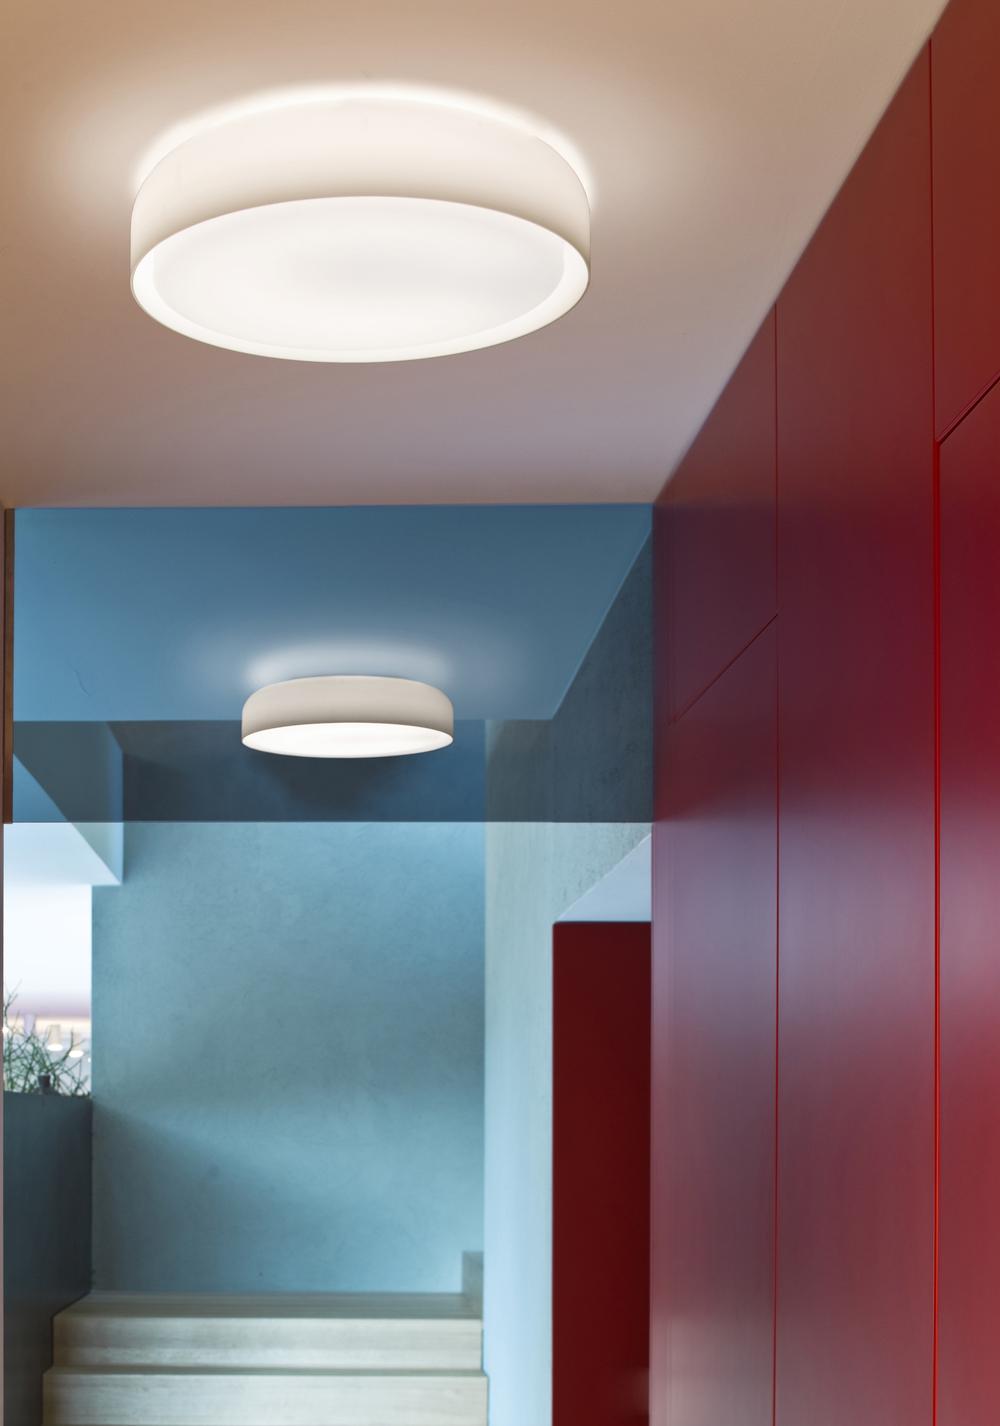 Prandina Mint wall or ceiling fixture